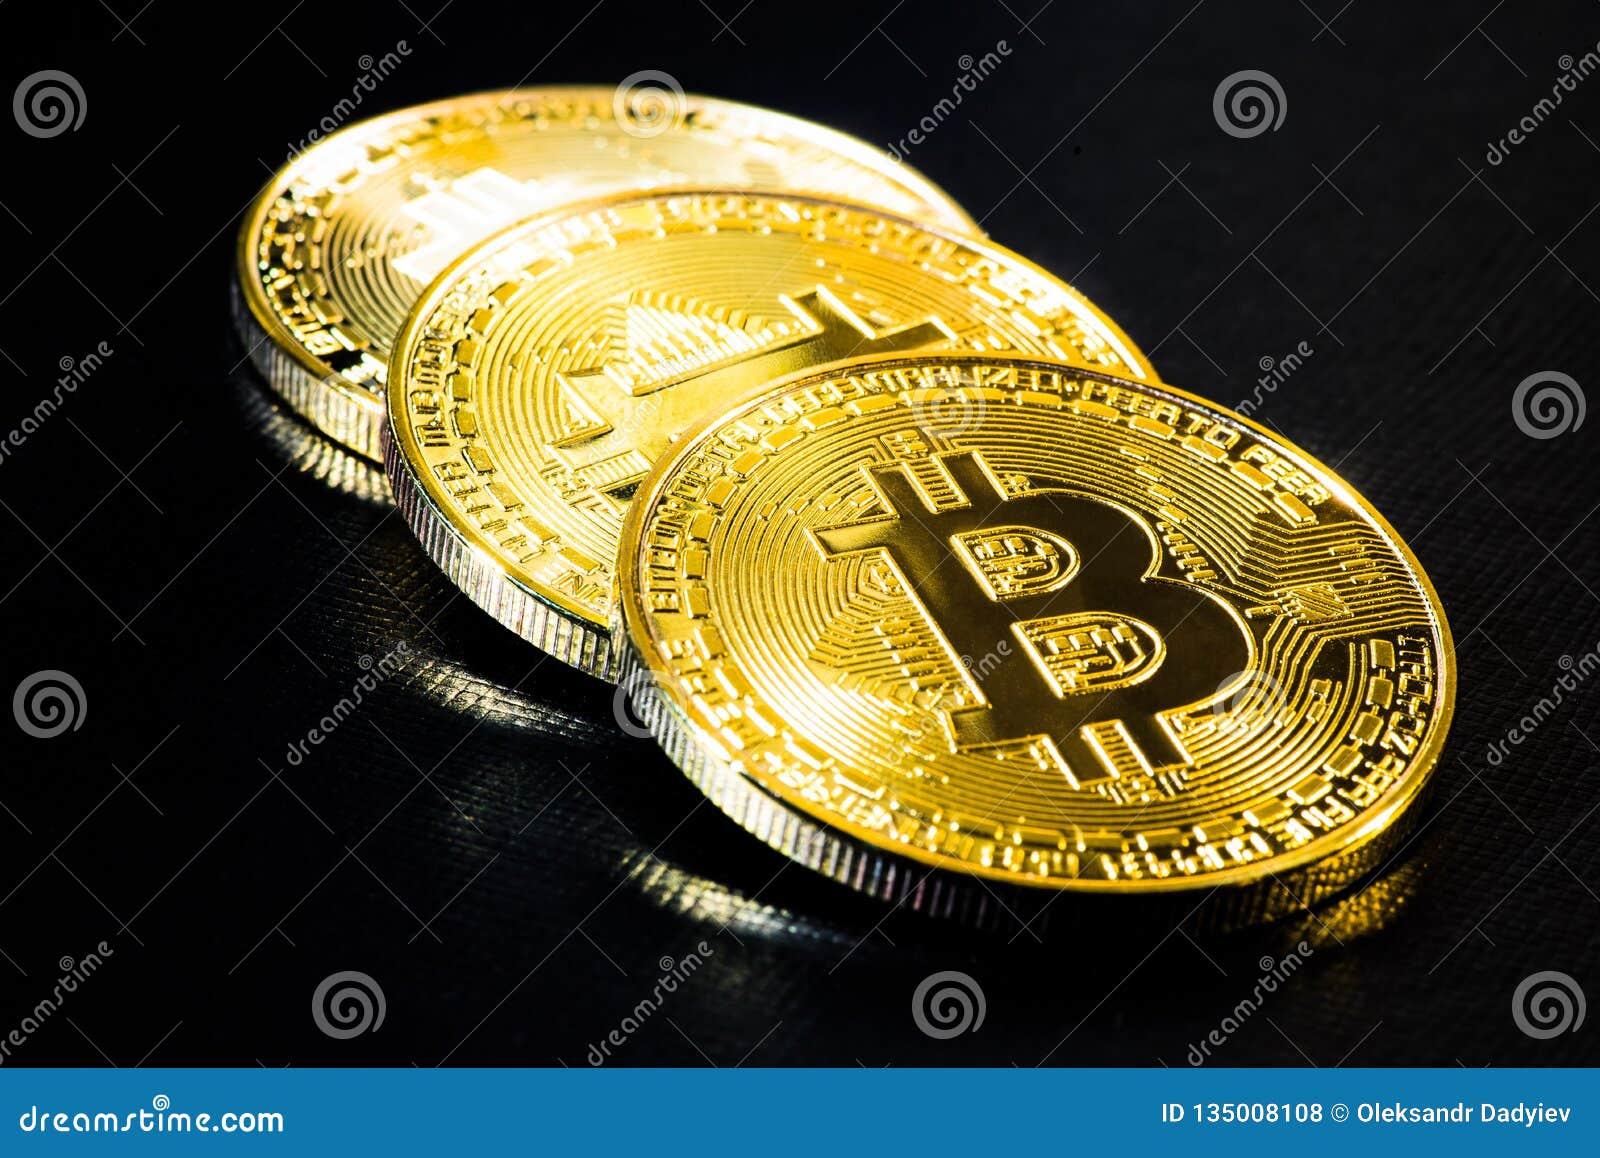 3 bitcoins how to convert money to bitcoins value